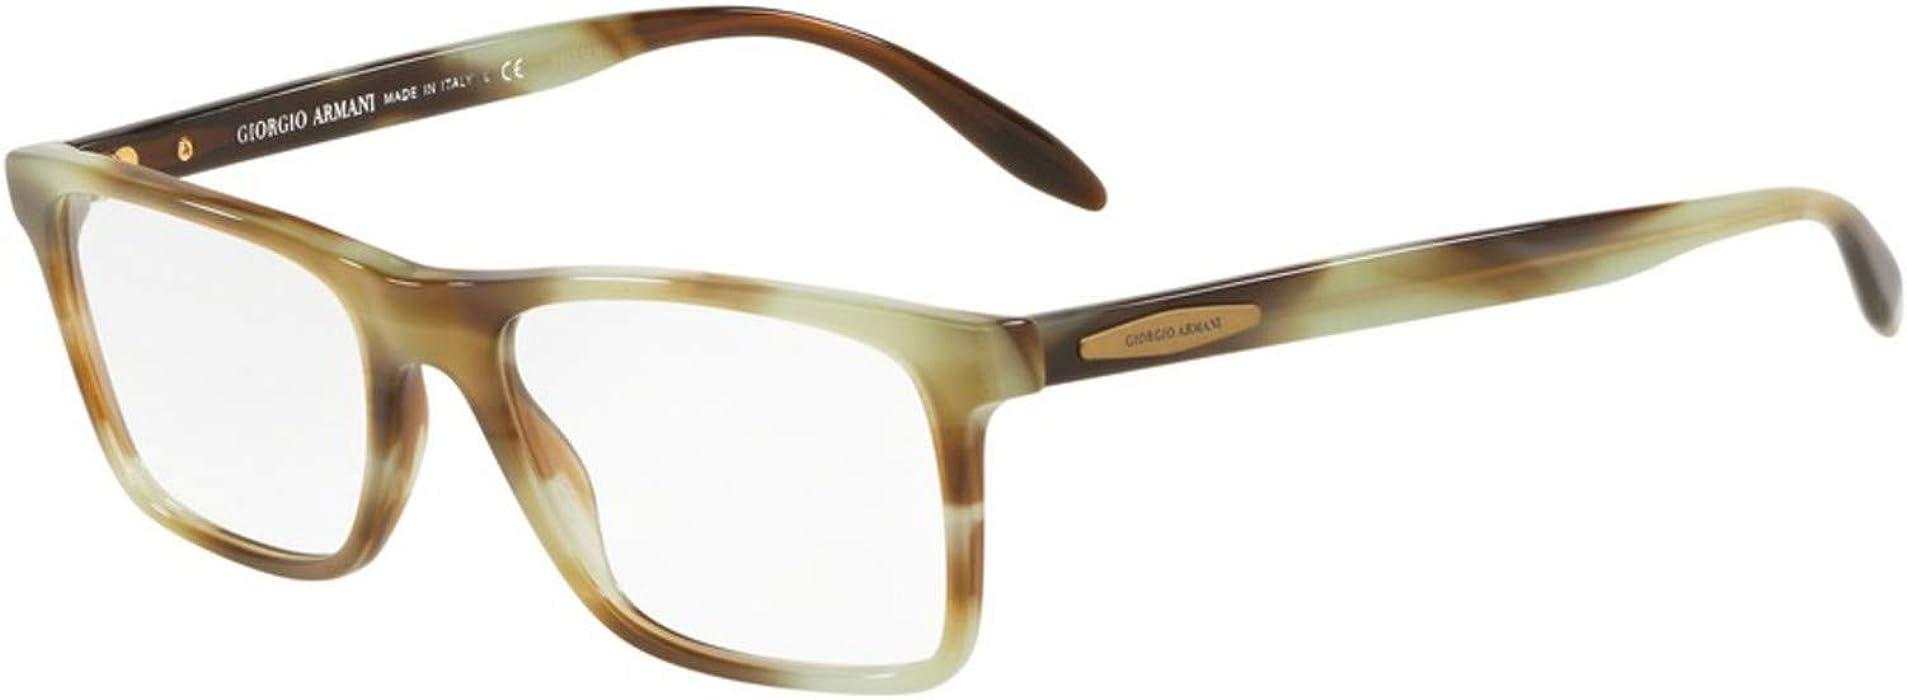 d16c15a3eea Eyeglasses Giorgio Armani AR 7163 5708 STRIPED GREEN at Amazon Men s  Clothing store